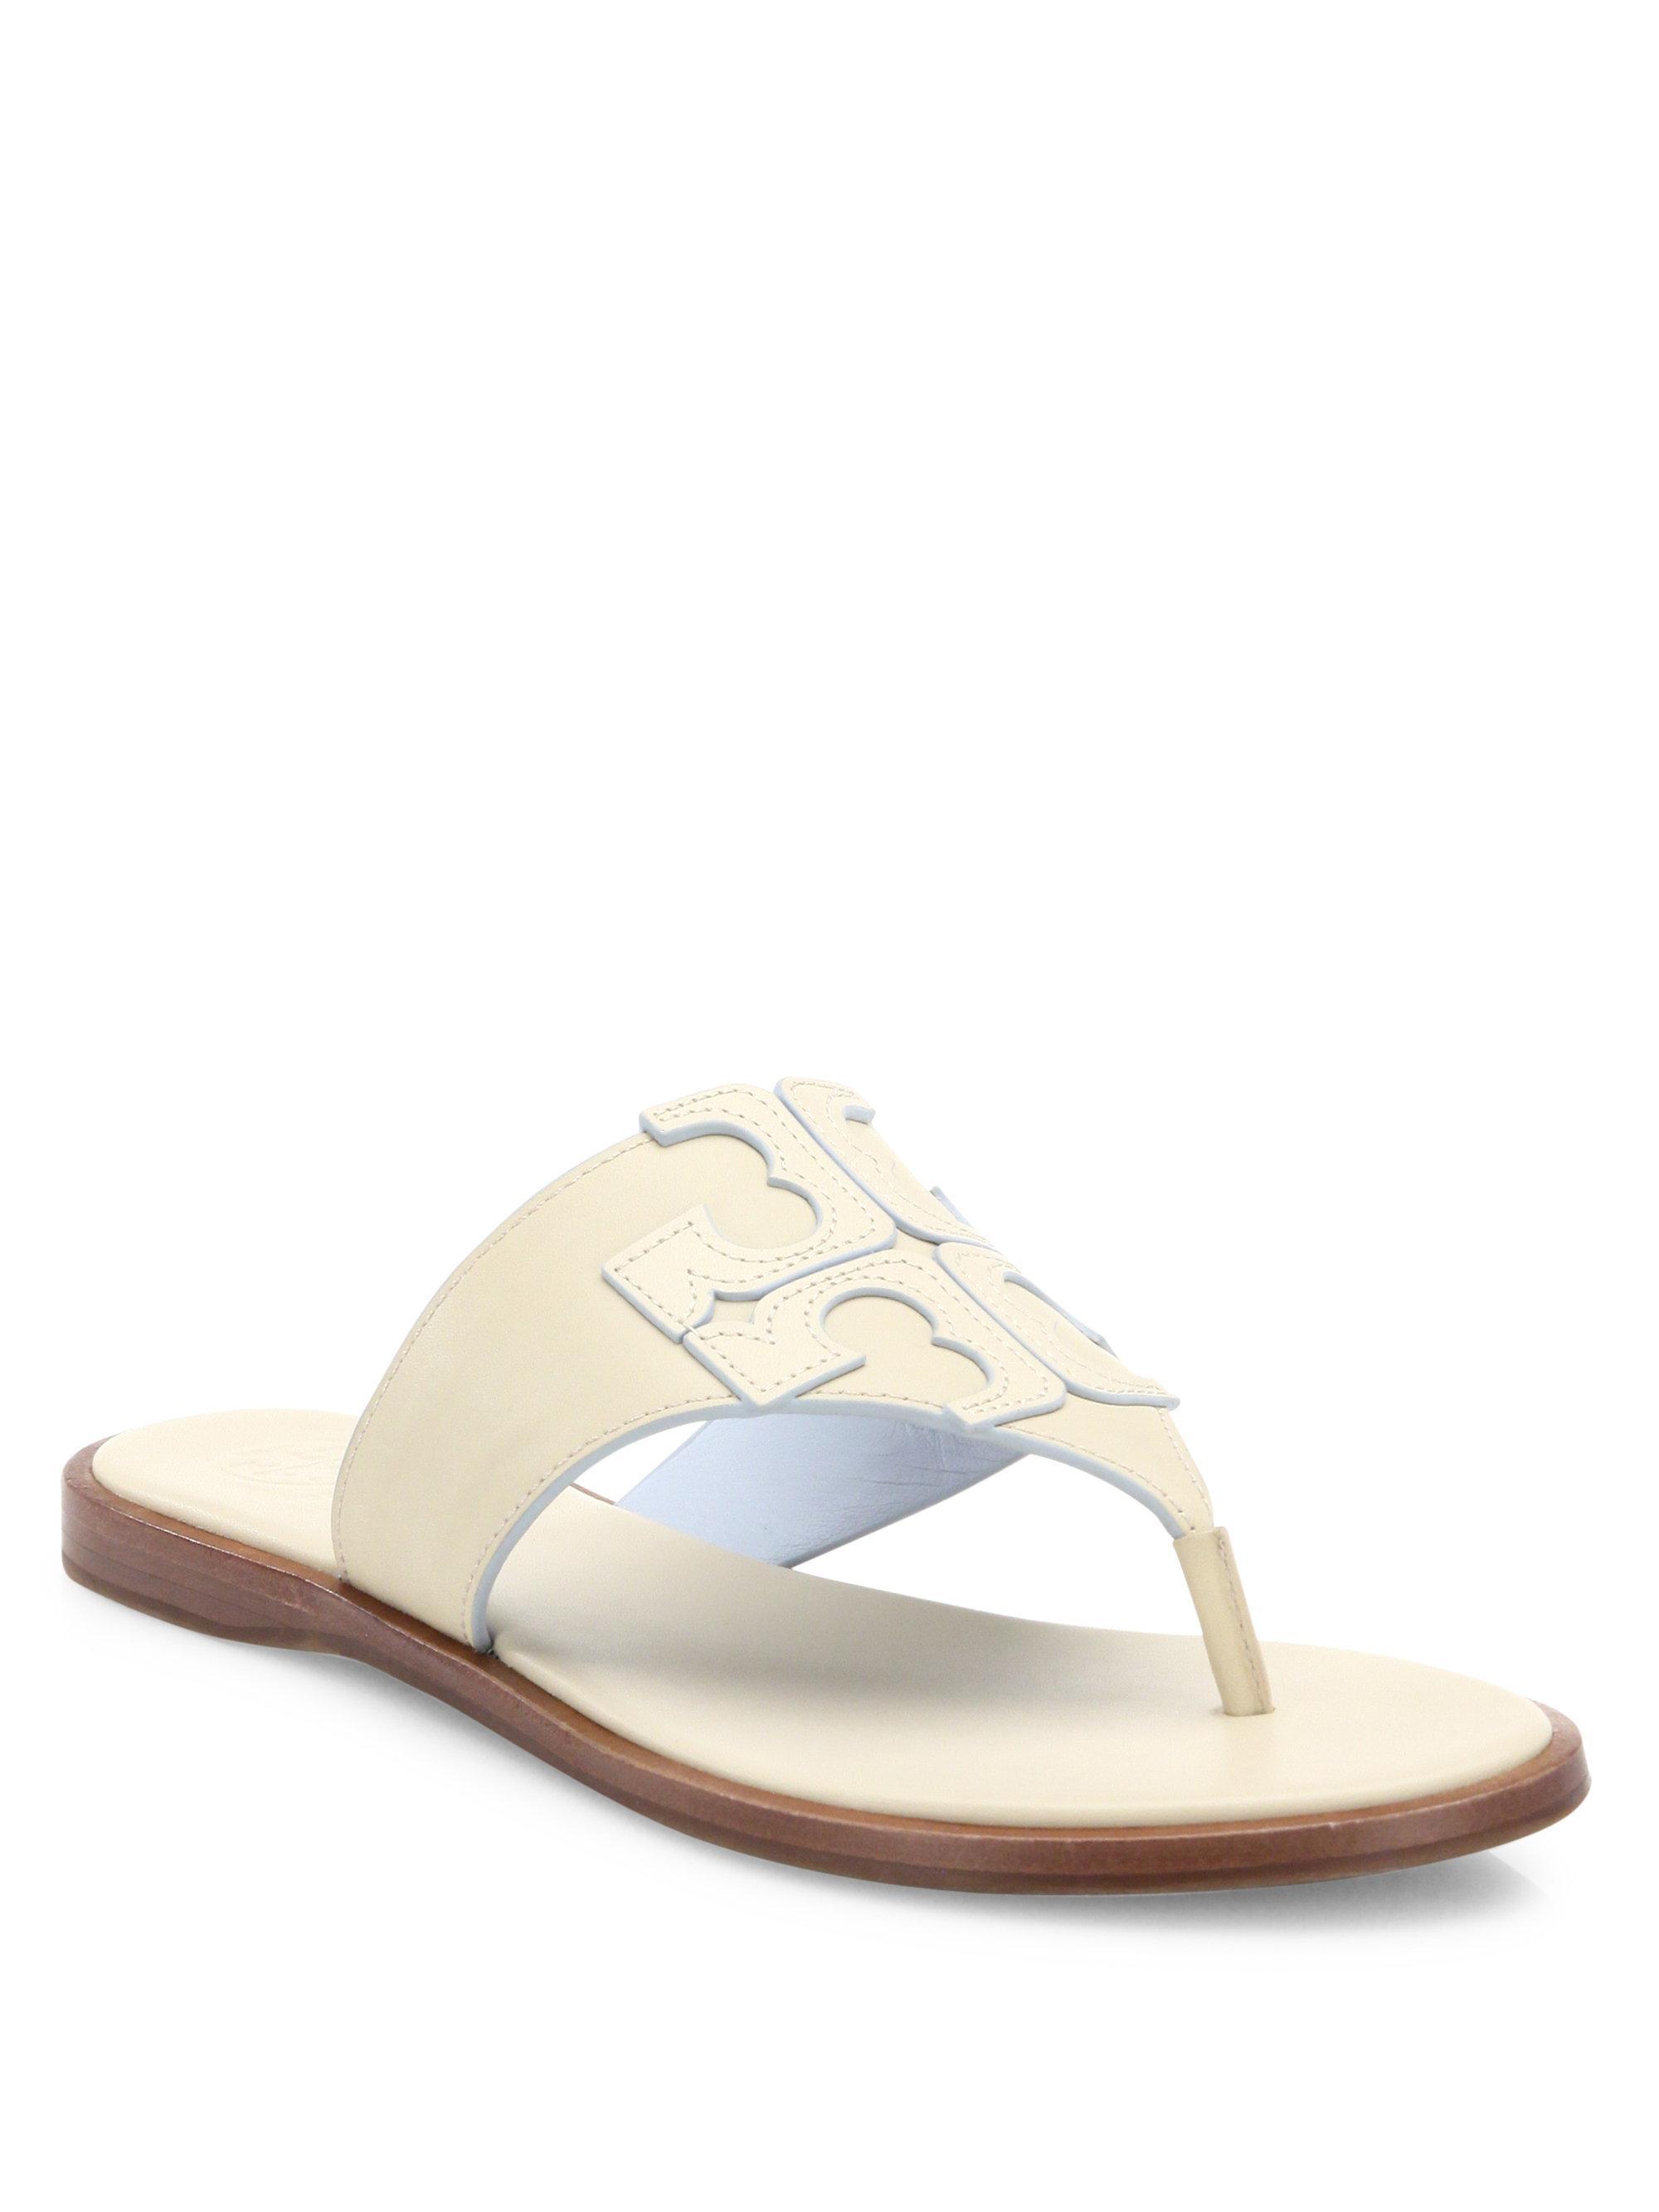 d95d2f91675b Lyst - Tory Burch Jamie Logo Thong Sandals